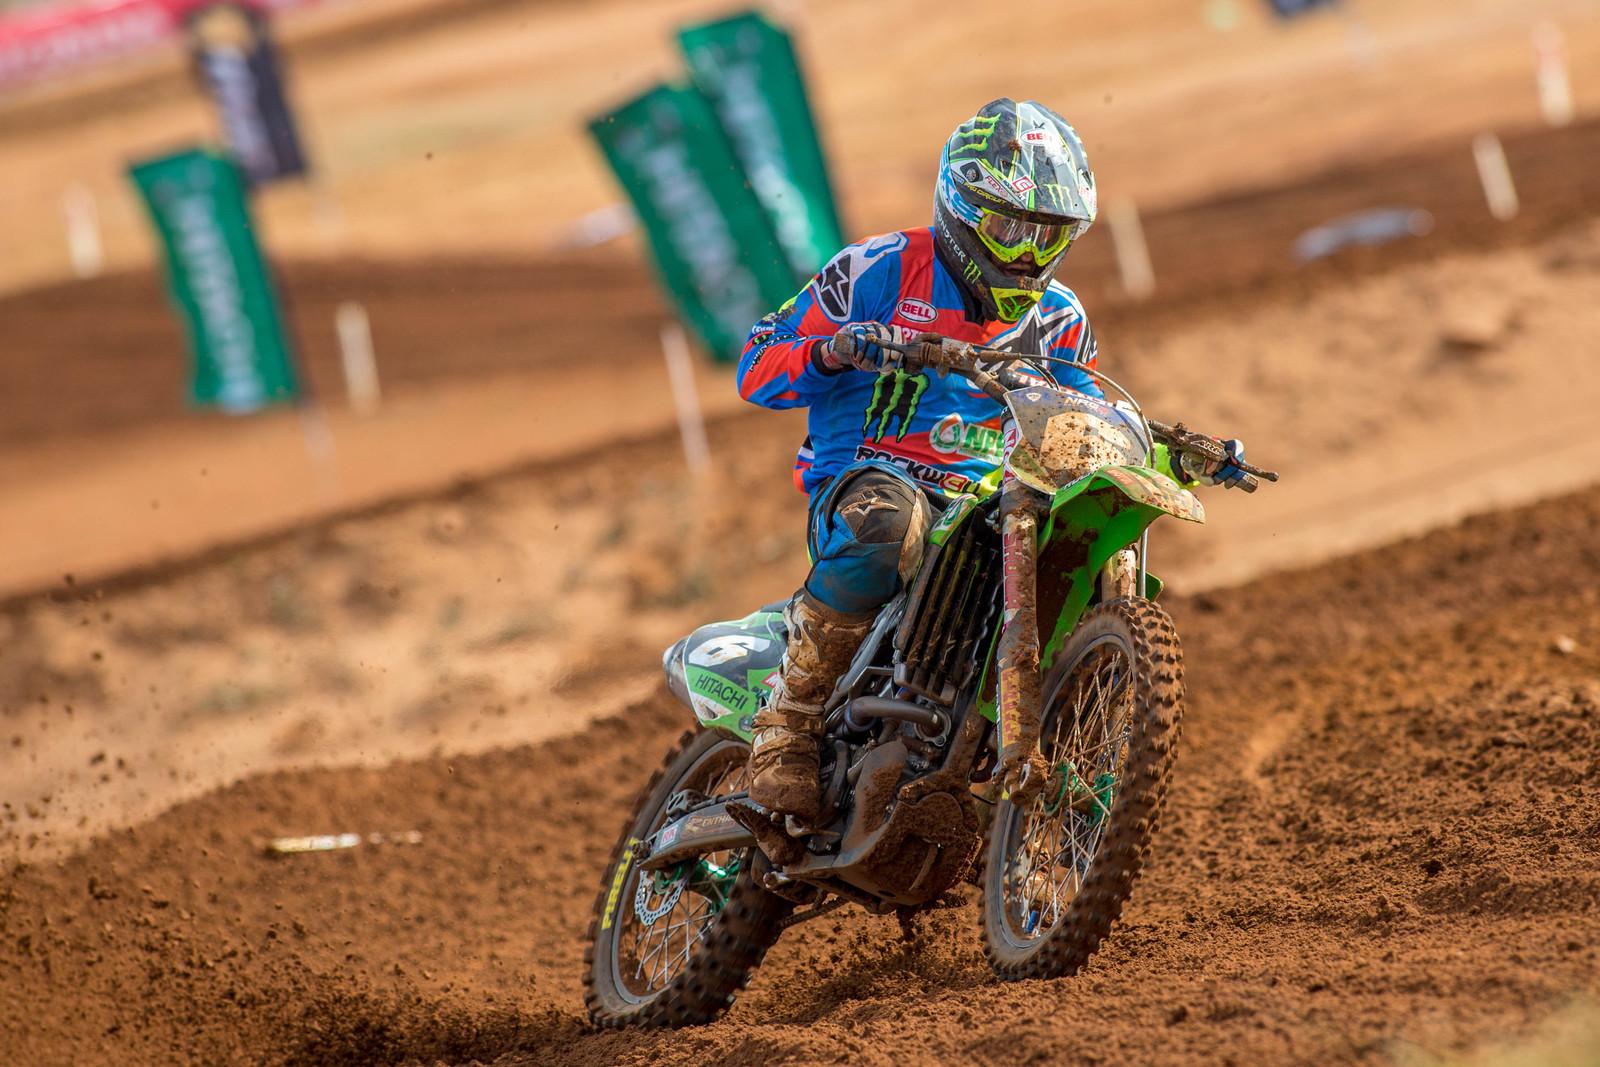 Jake Moss - Australian Motul Mx Championships: Round 4, Murray Bridge - Motocross Pictures - Vital MX